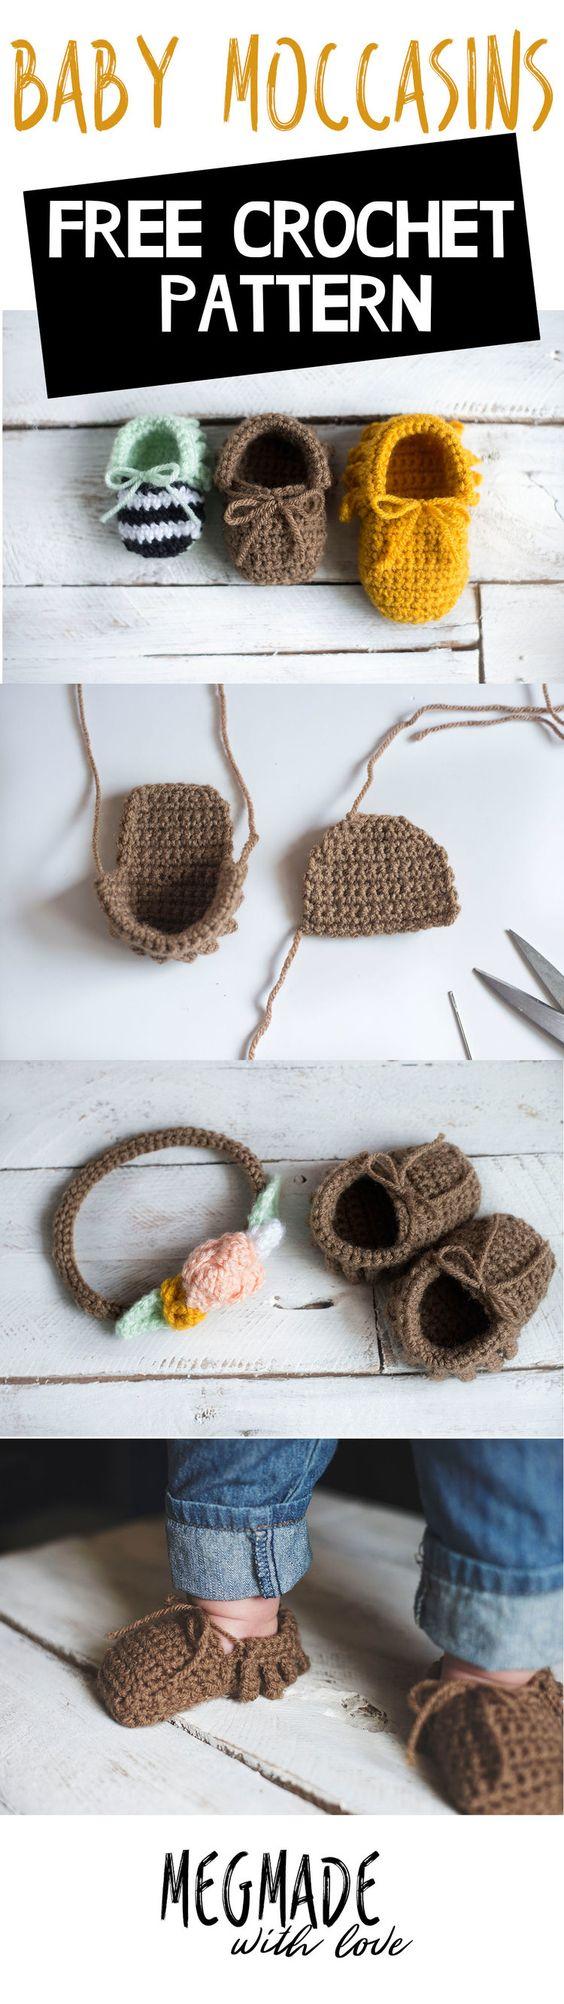 Crochet Baby Moccasins Pattern.